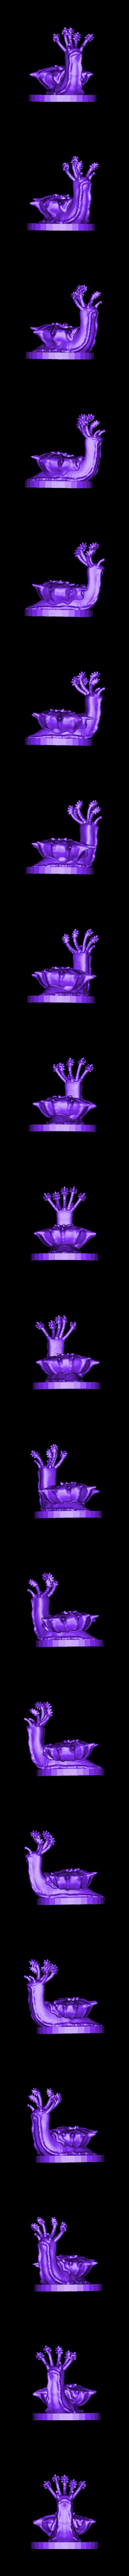 flailsnailstl.stl Download free STL file flail snail • 3D printing design, kphillsculpting